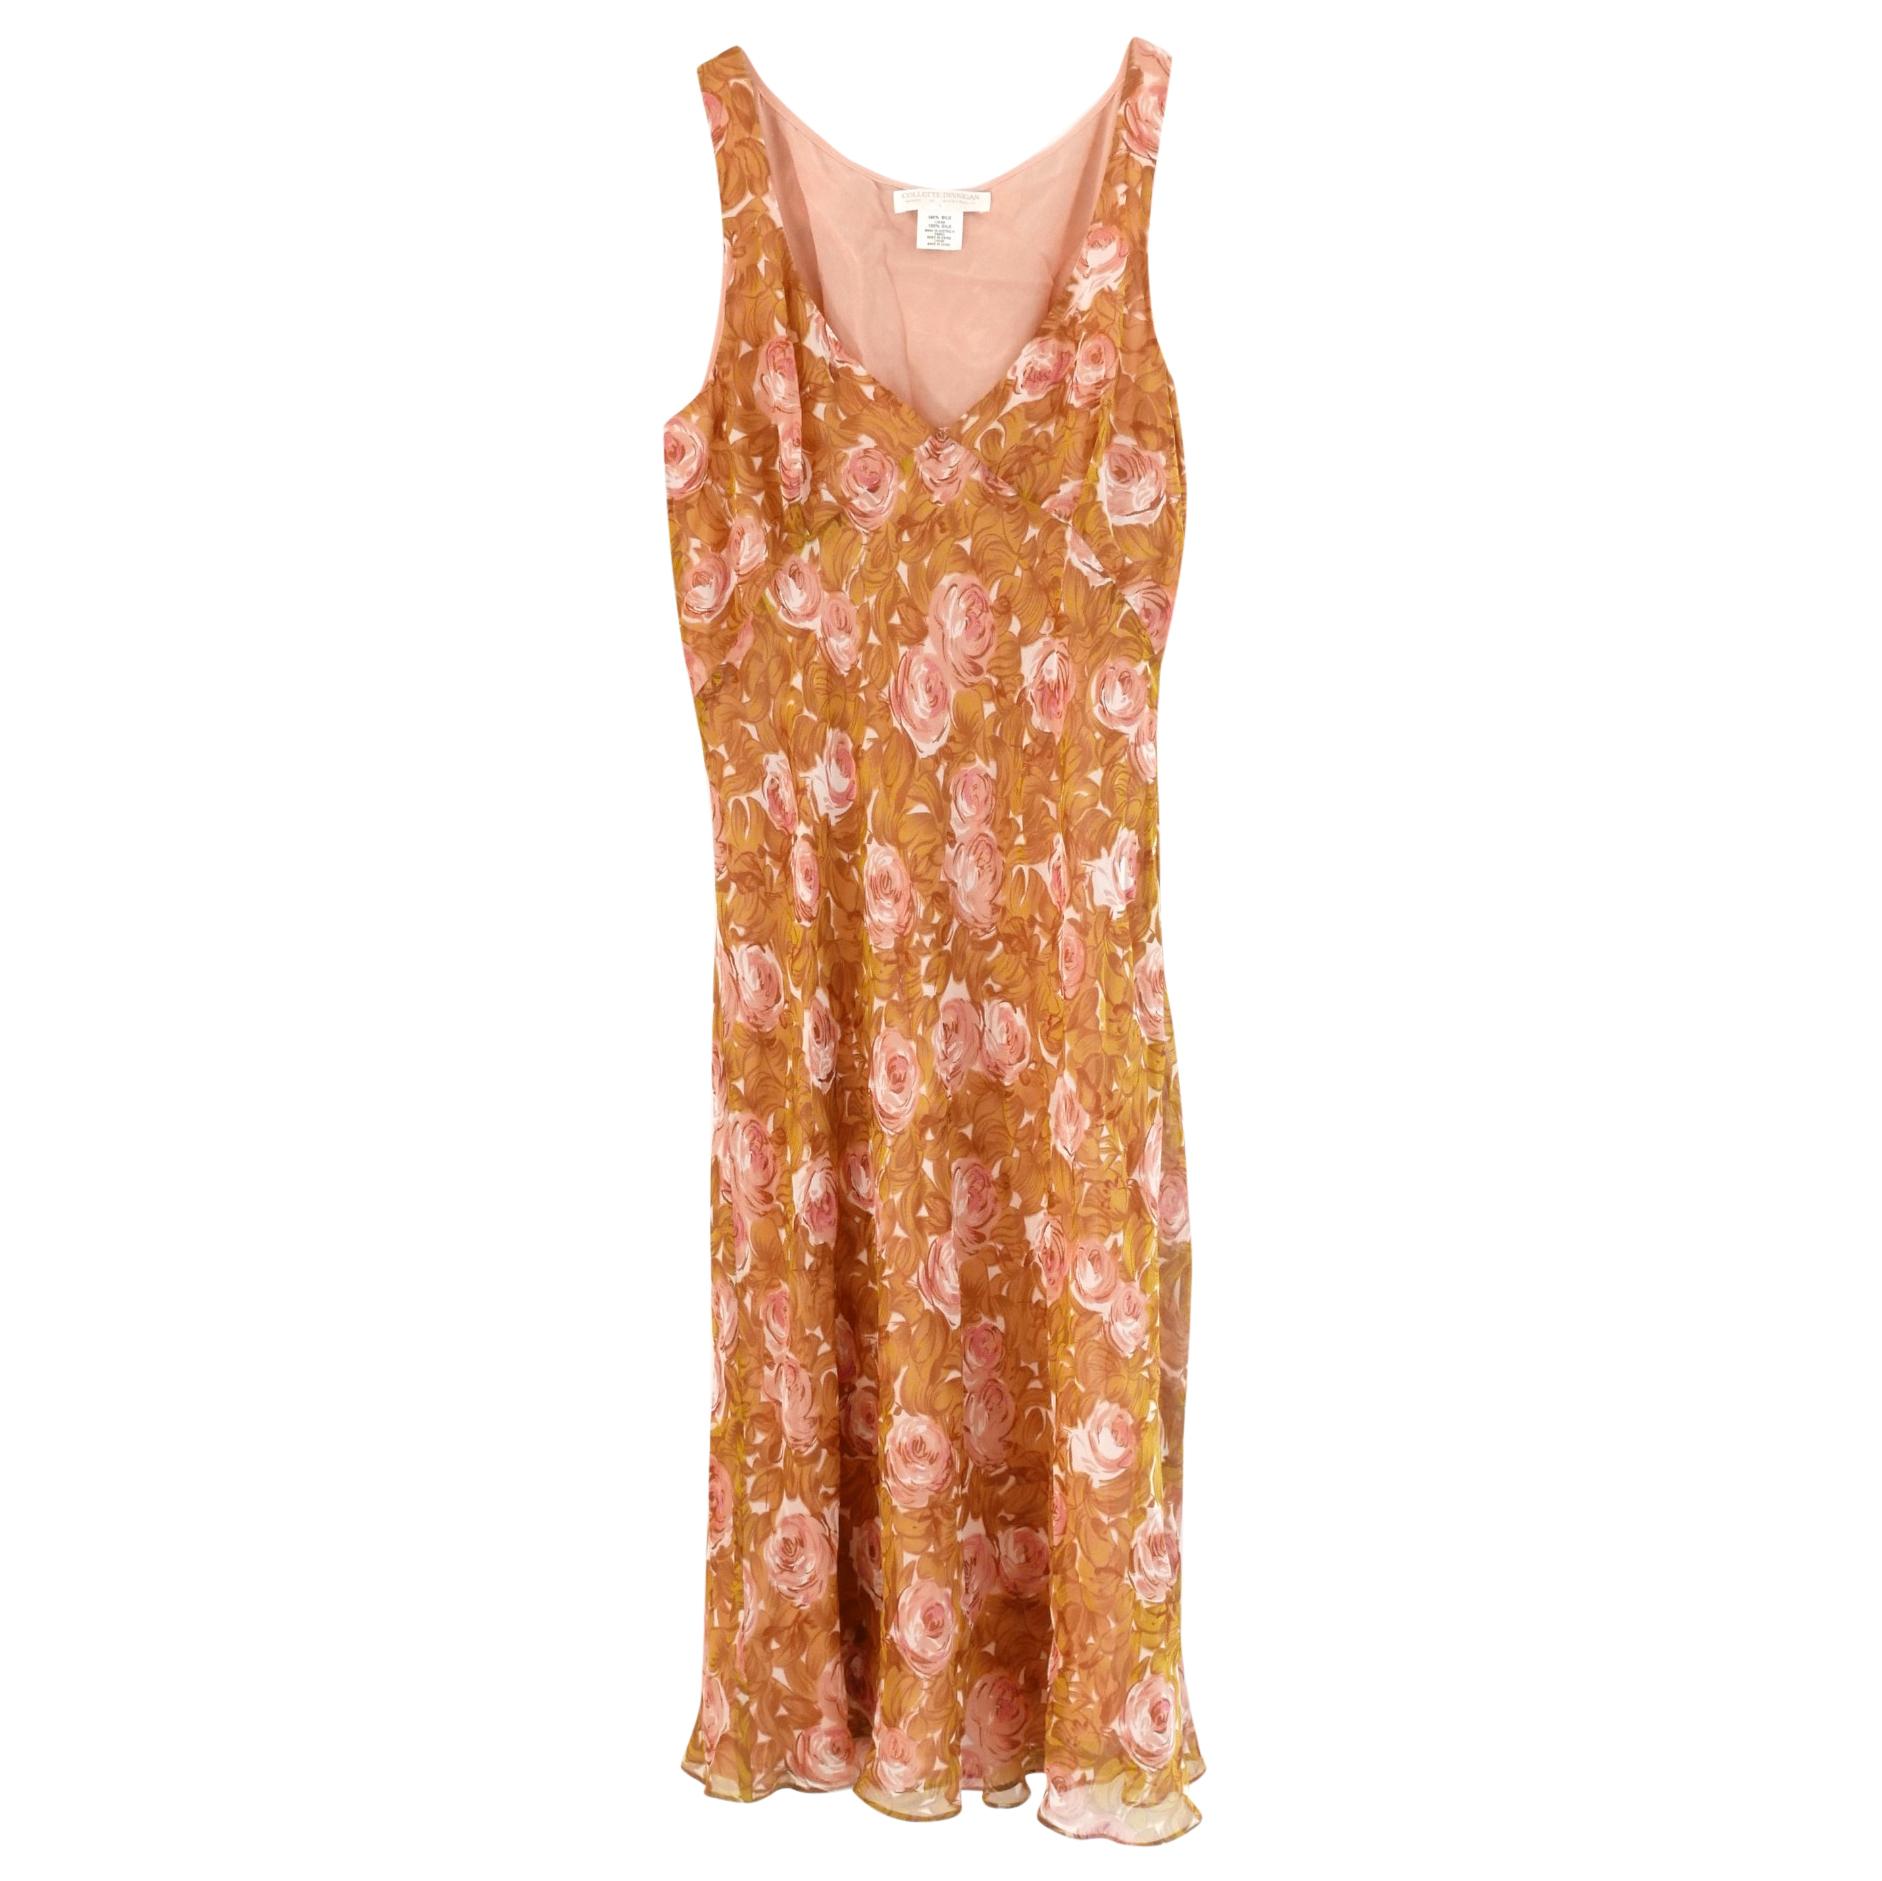 Collette Dinnigan Floral Silk Mini Dress